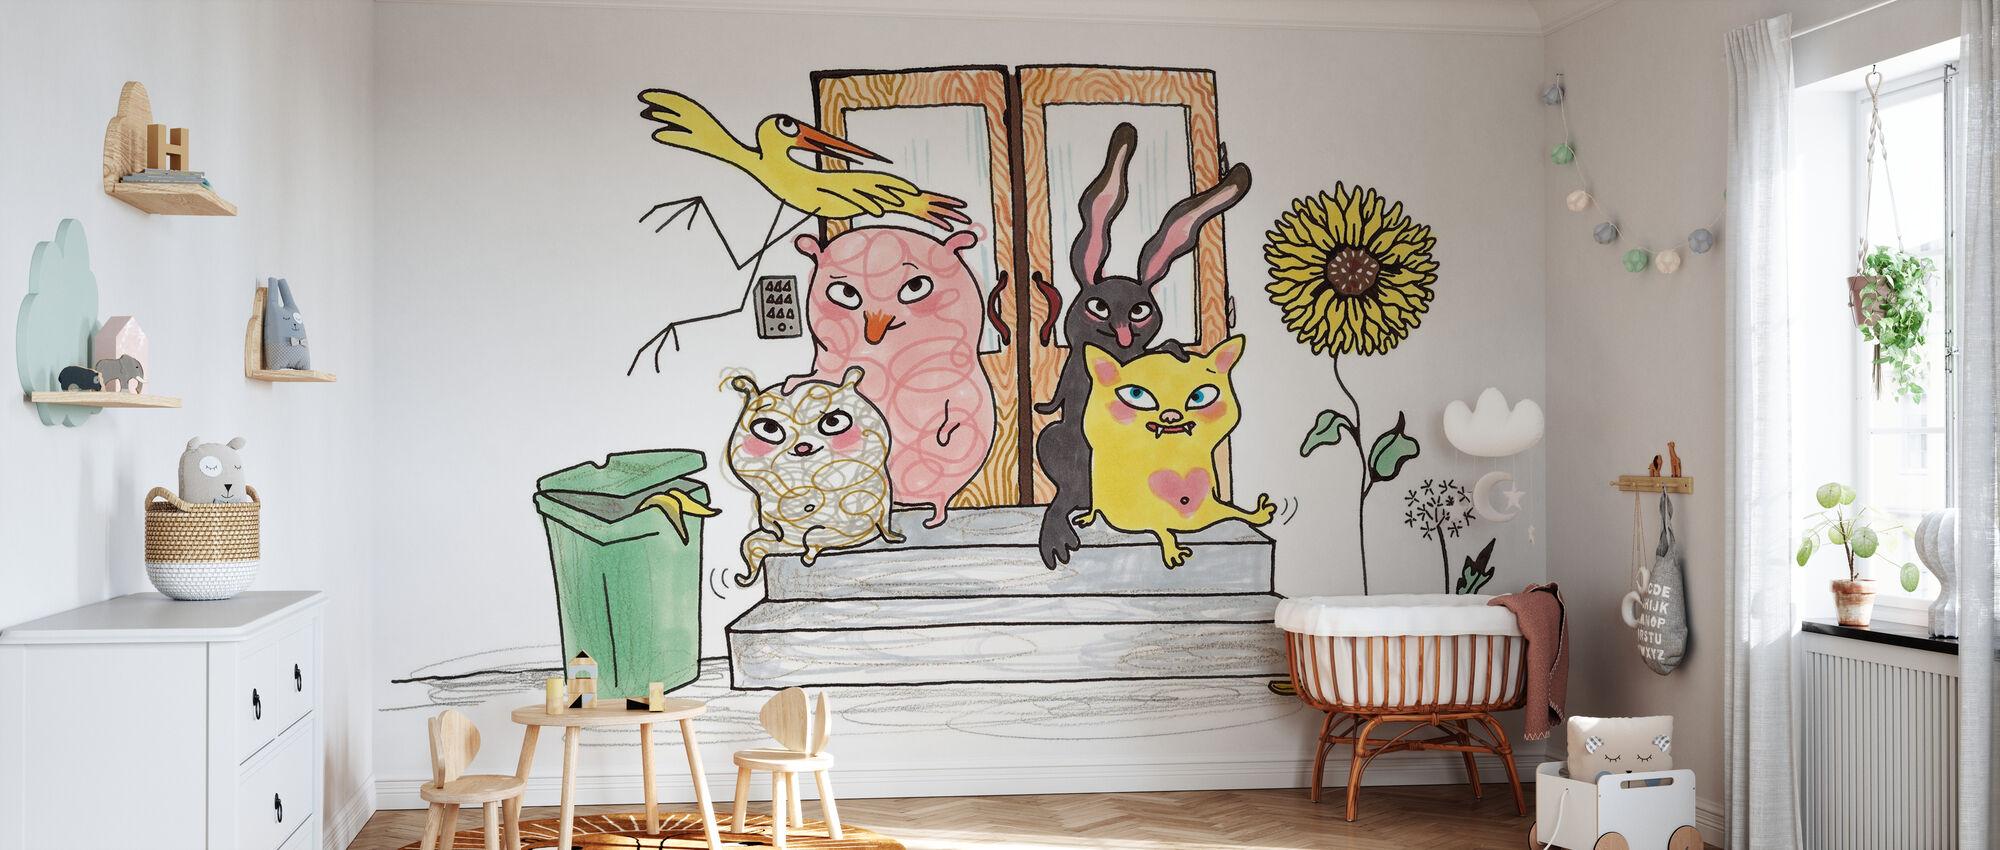 Who lives here - Wallpaper - Nursery